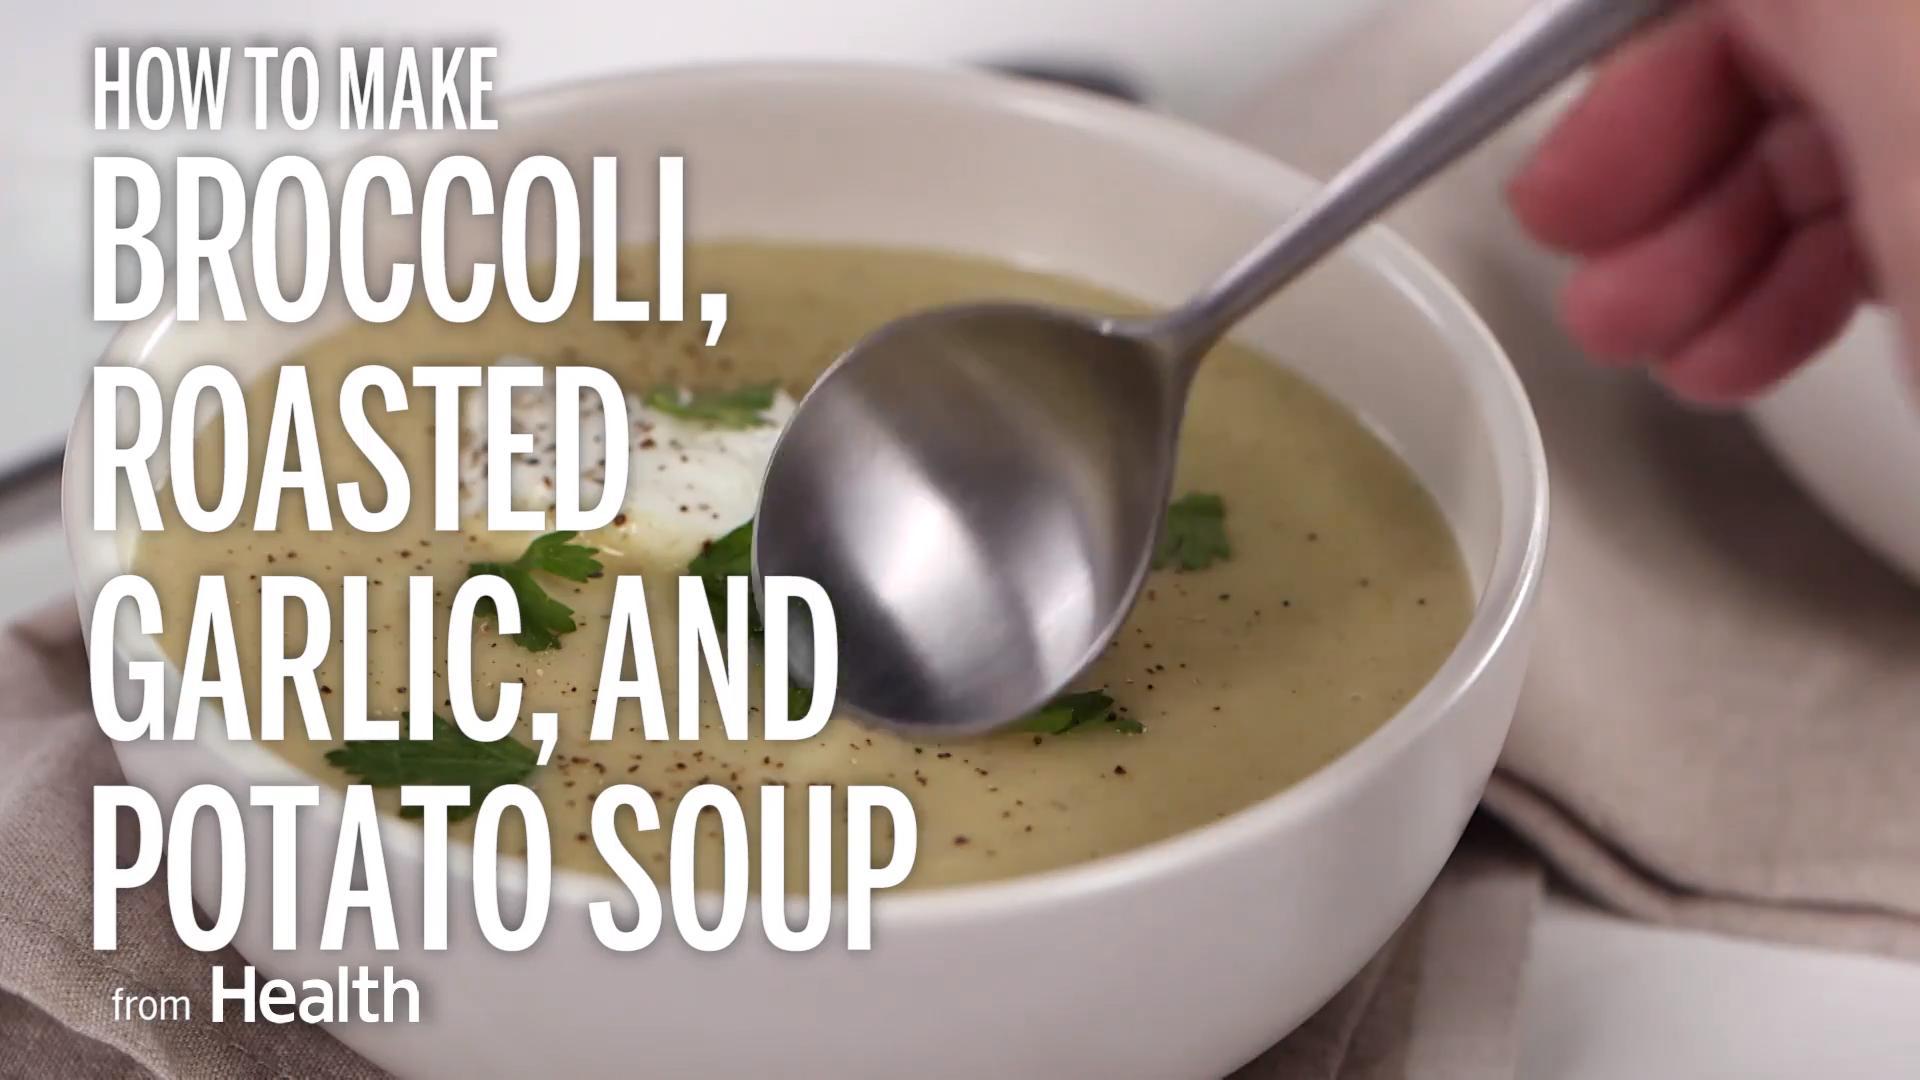 Broccoli, Roasted Garlic, and Potato Soup